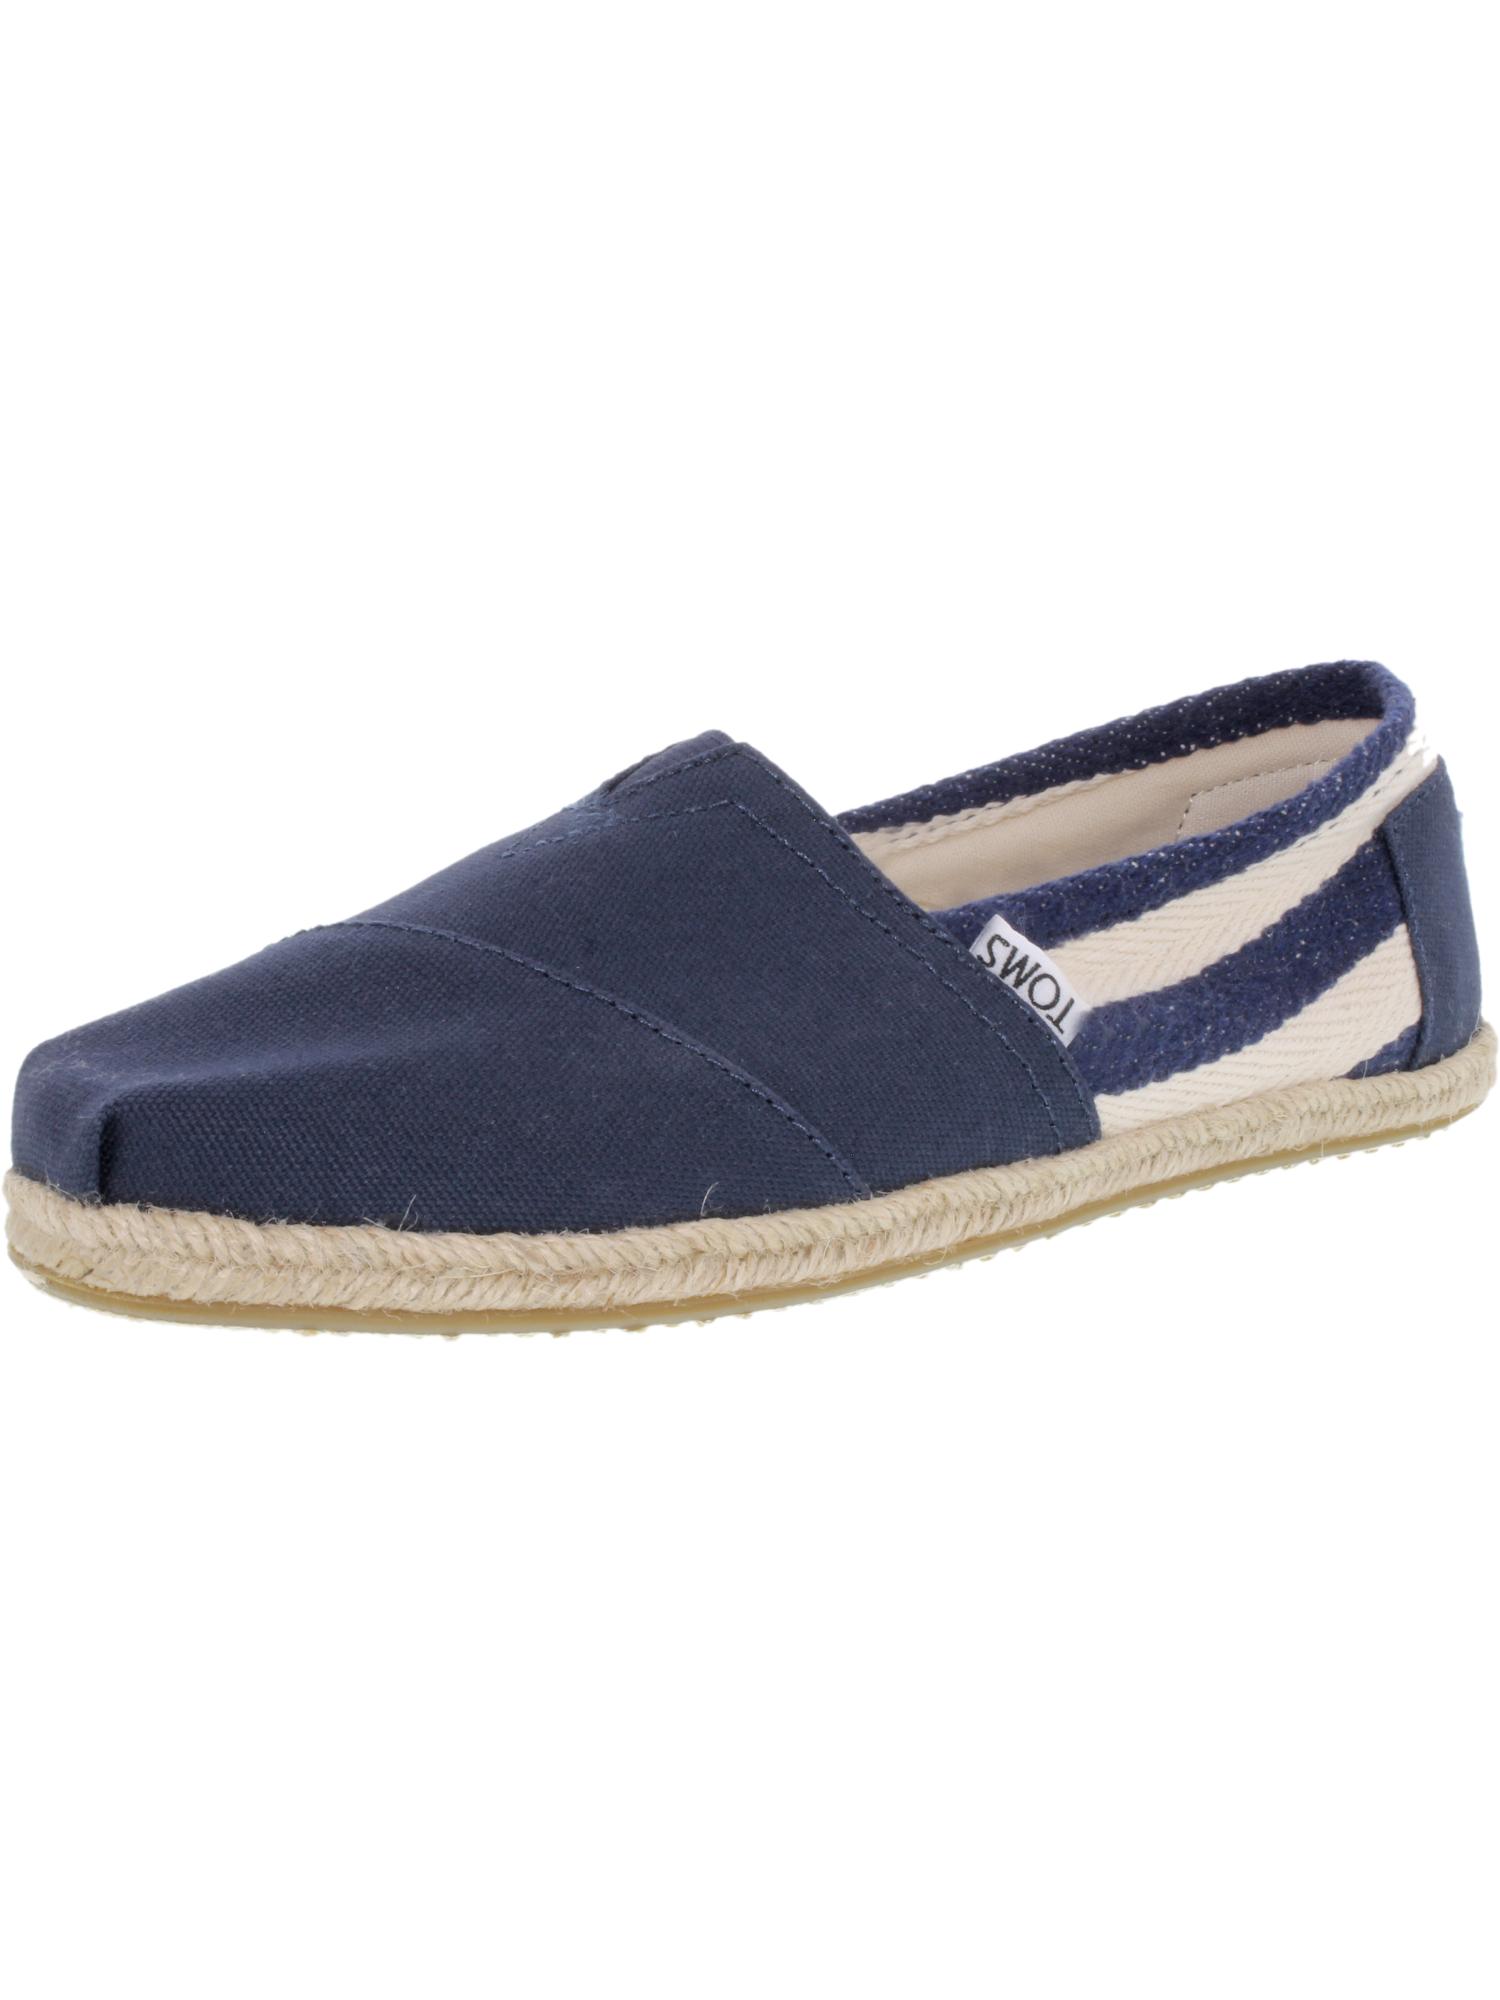 Womens Toms Grey University Classic Stripe Flat Shoes